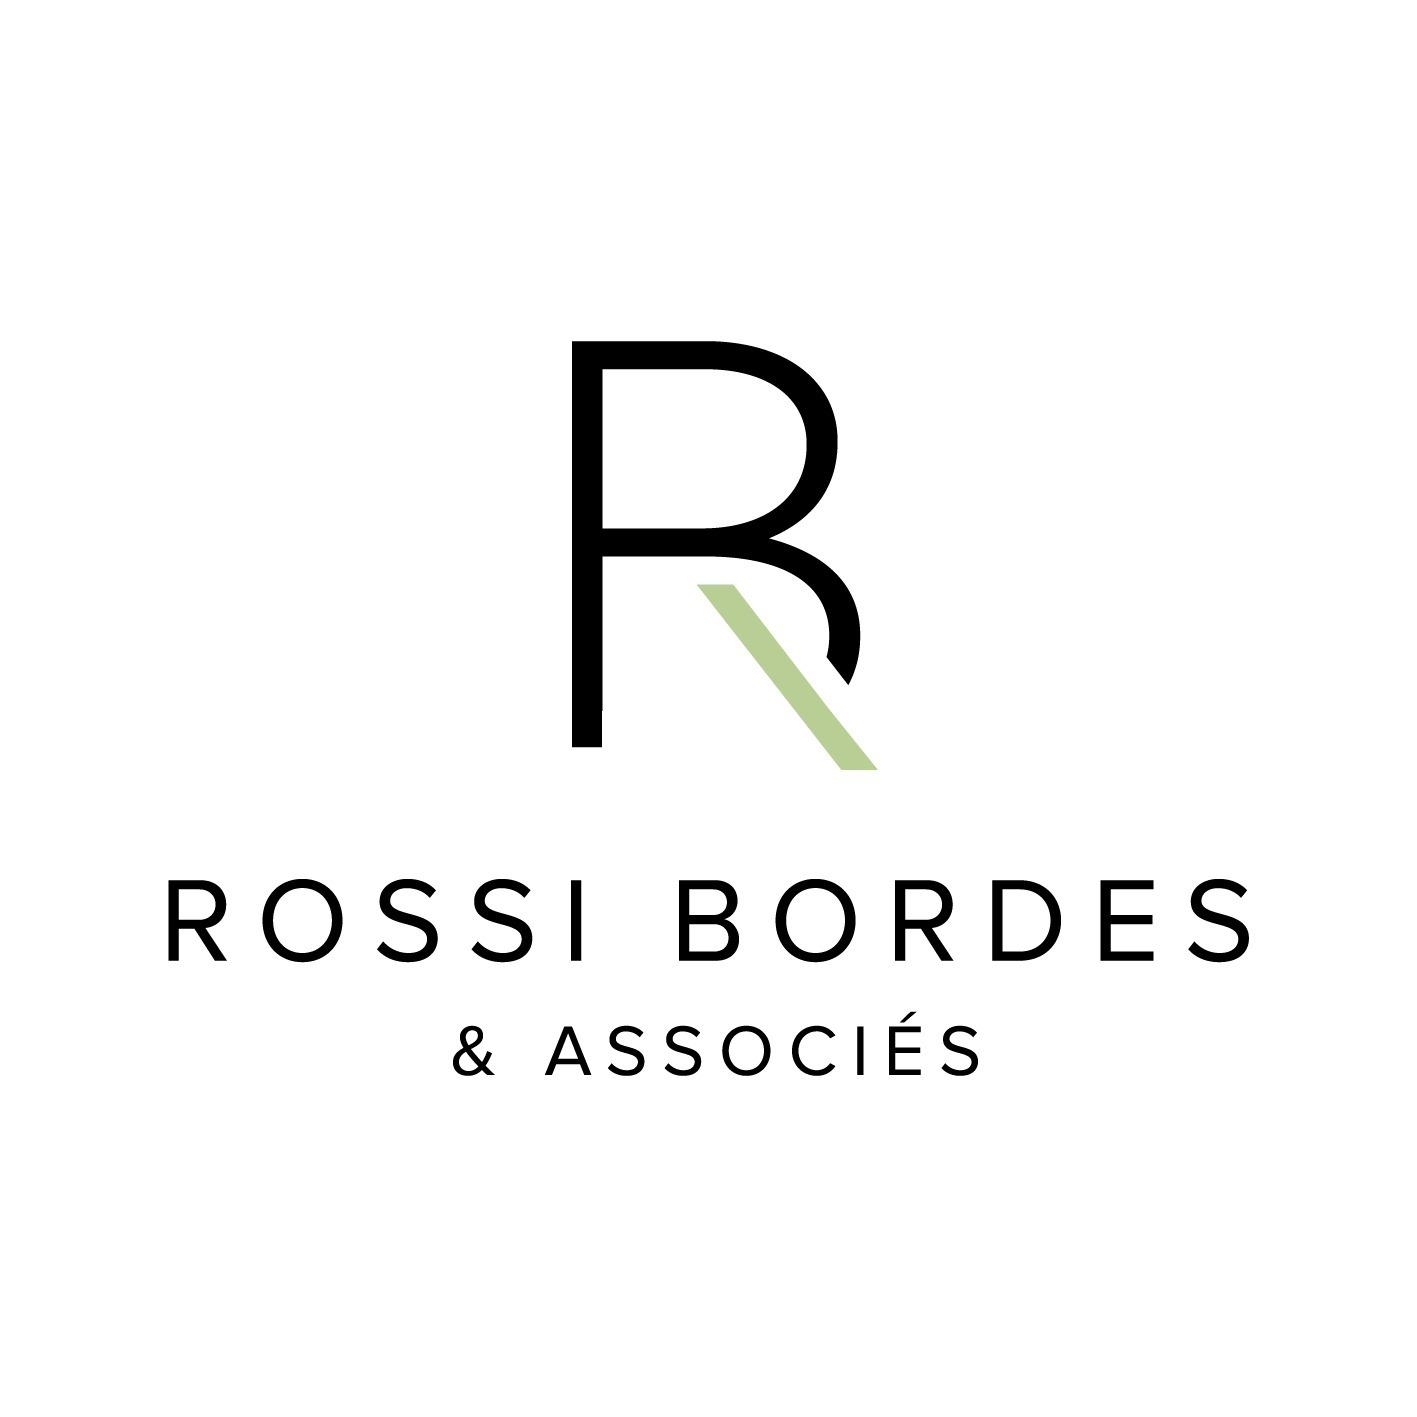 the Rossi Bordes & Associés logo.